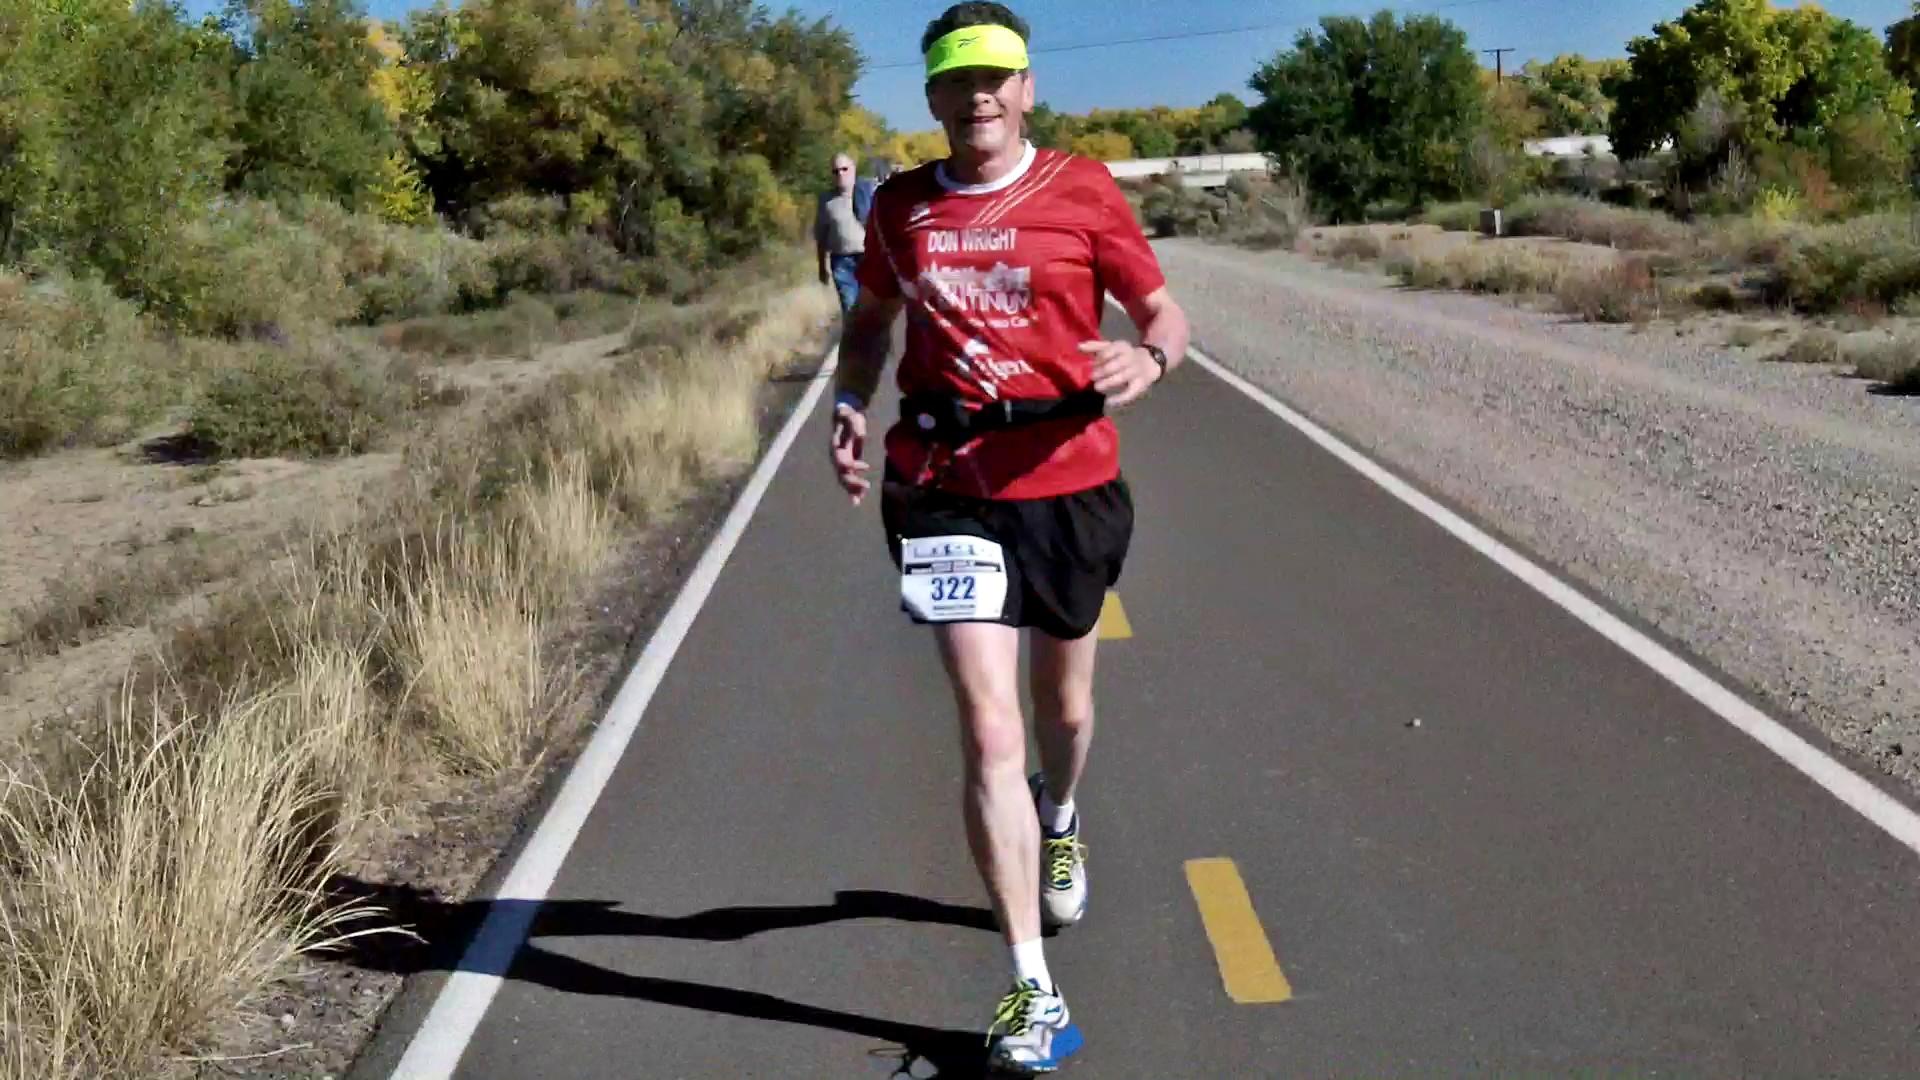 Fighting cancer, man to run 90th marathon